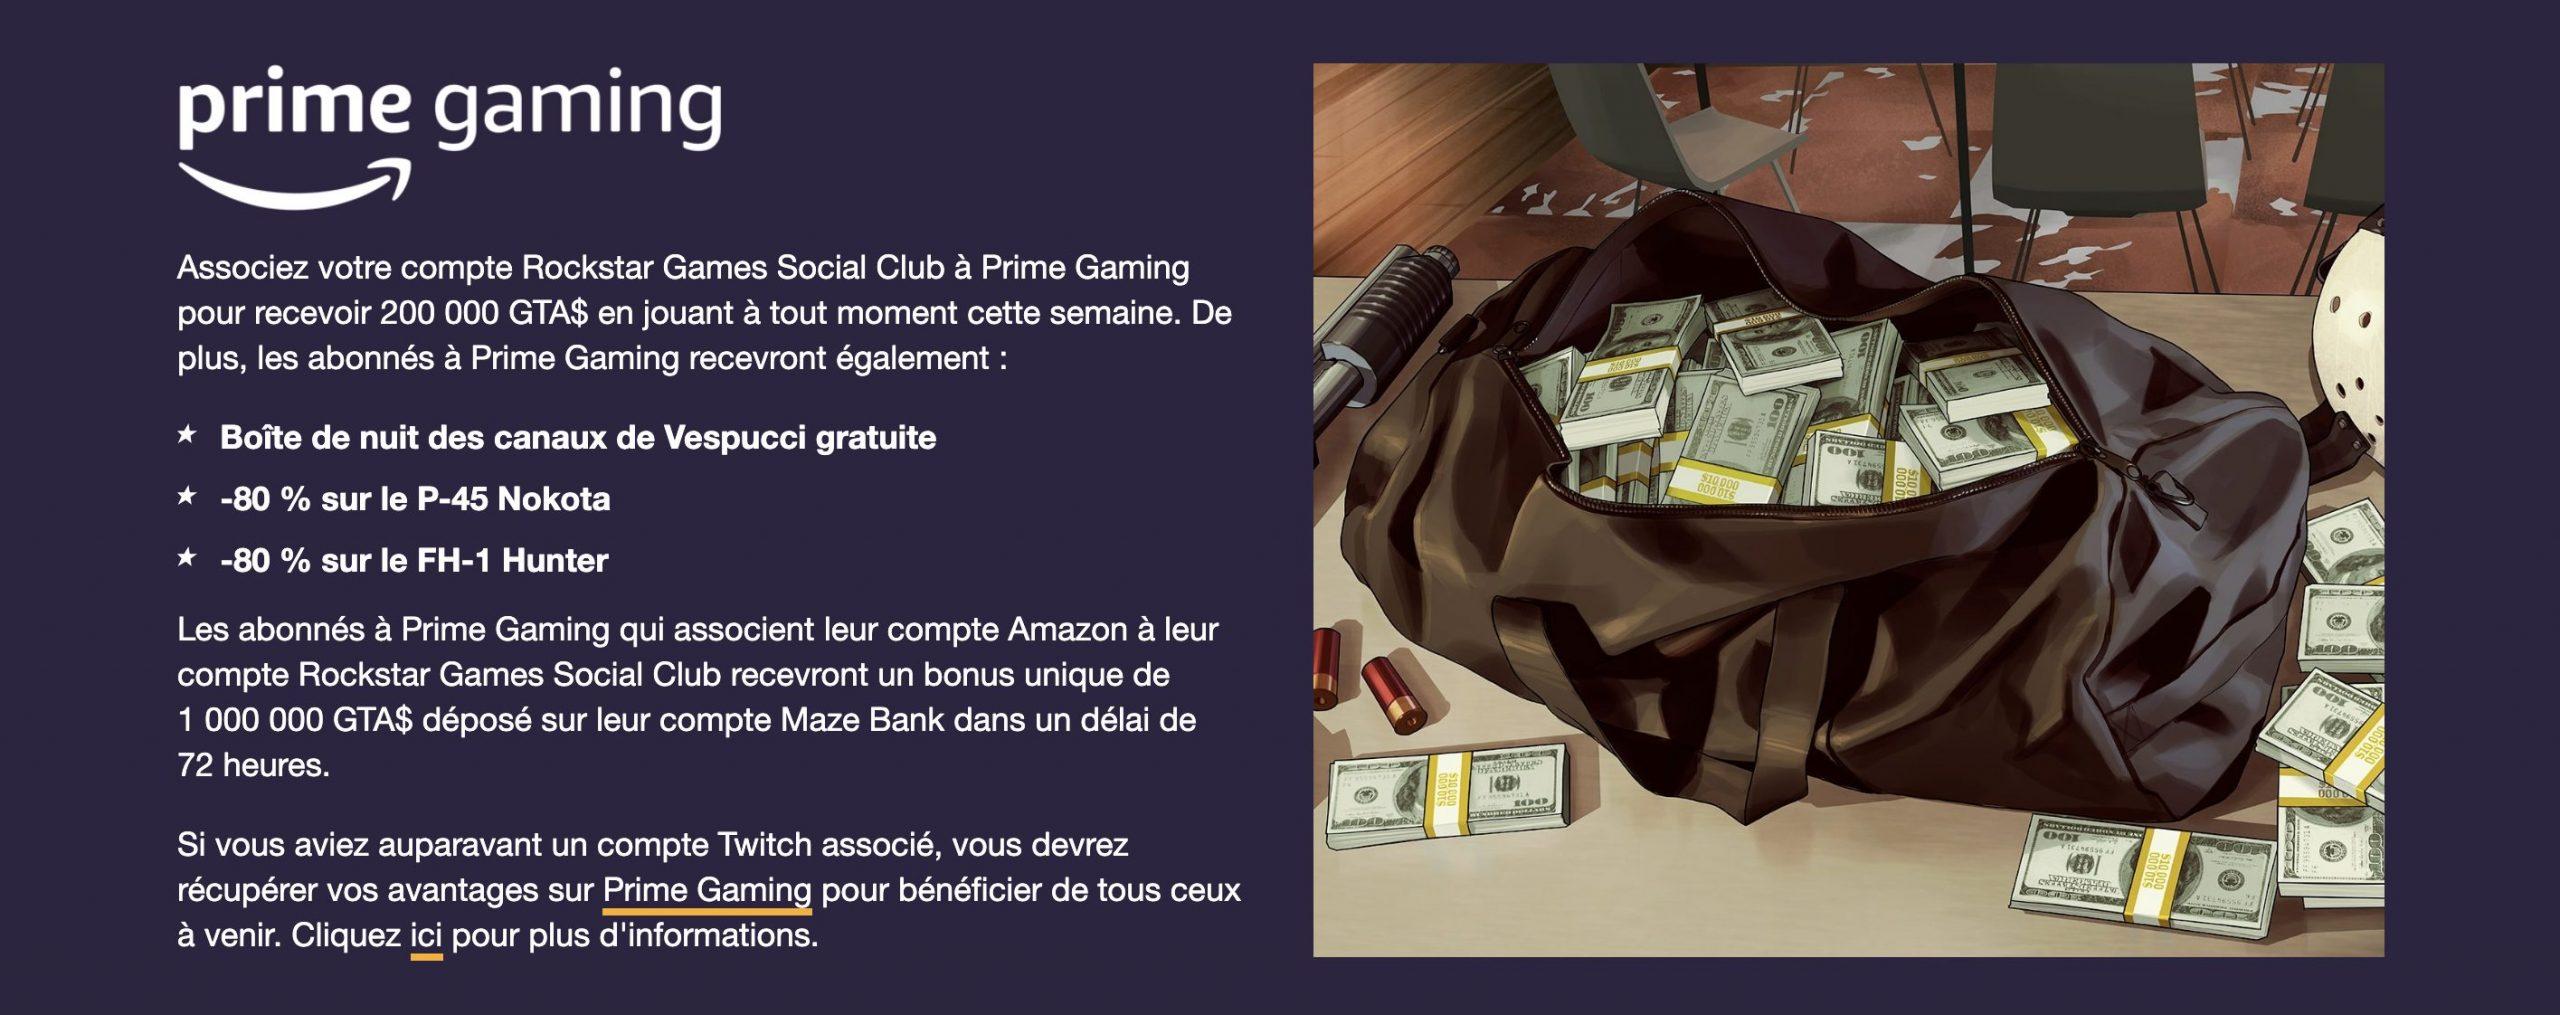 Prime Gaming GTA Online Semaine 15 Octobre 2020